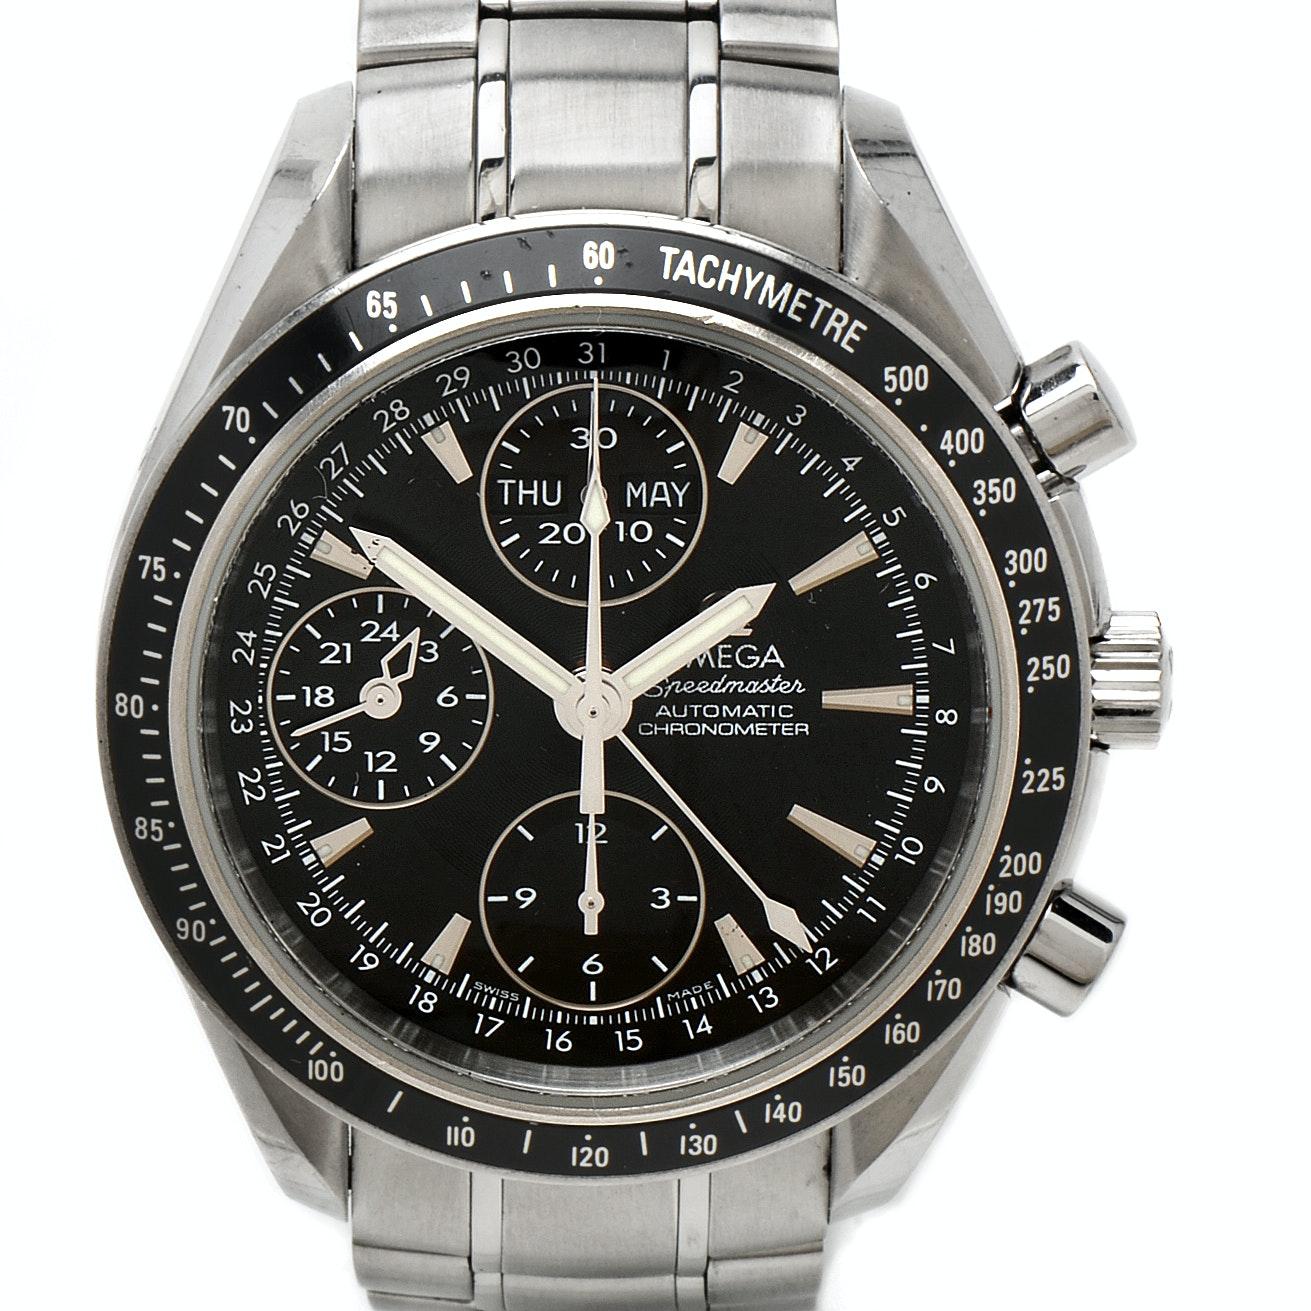 Omega Speedmaster Automatic Chronograph Triple Calendar Black Steel Wristwatch